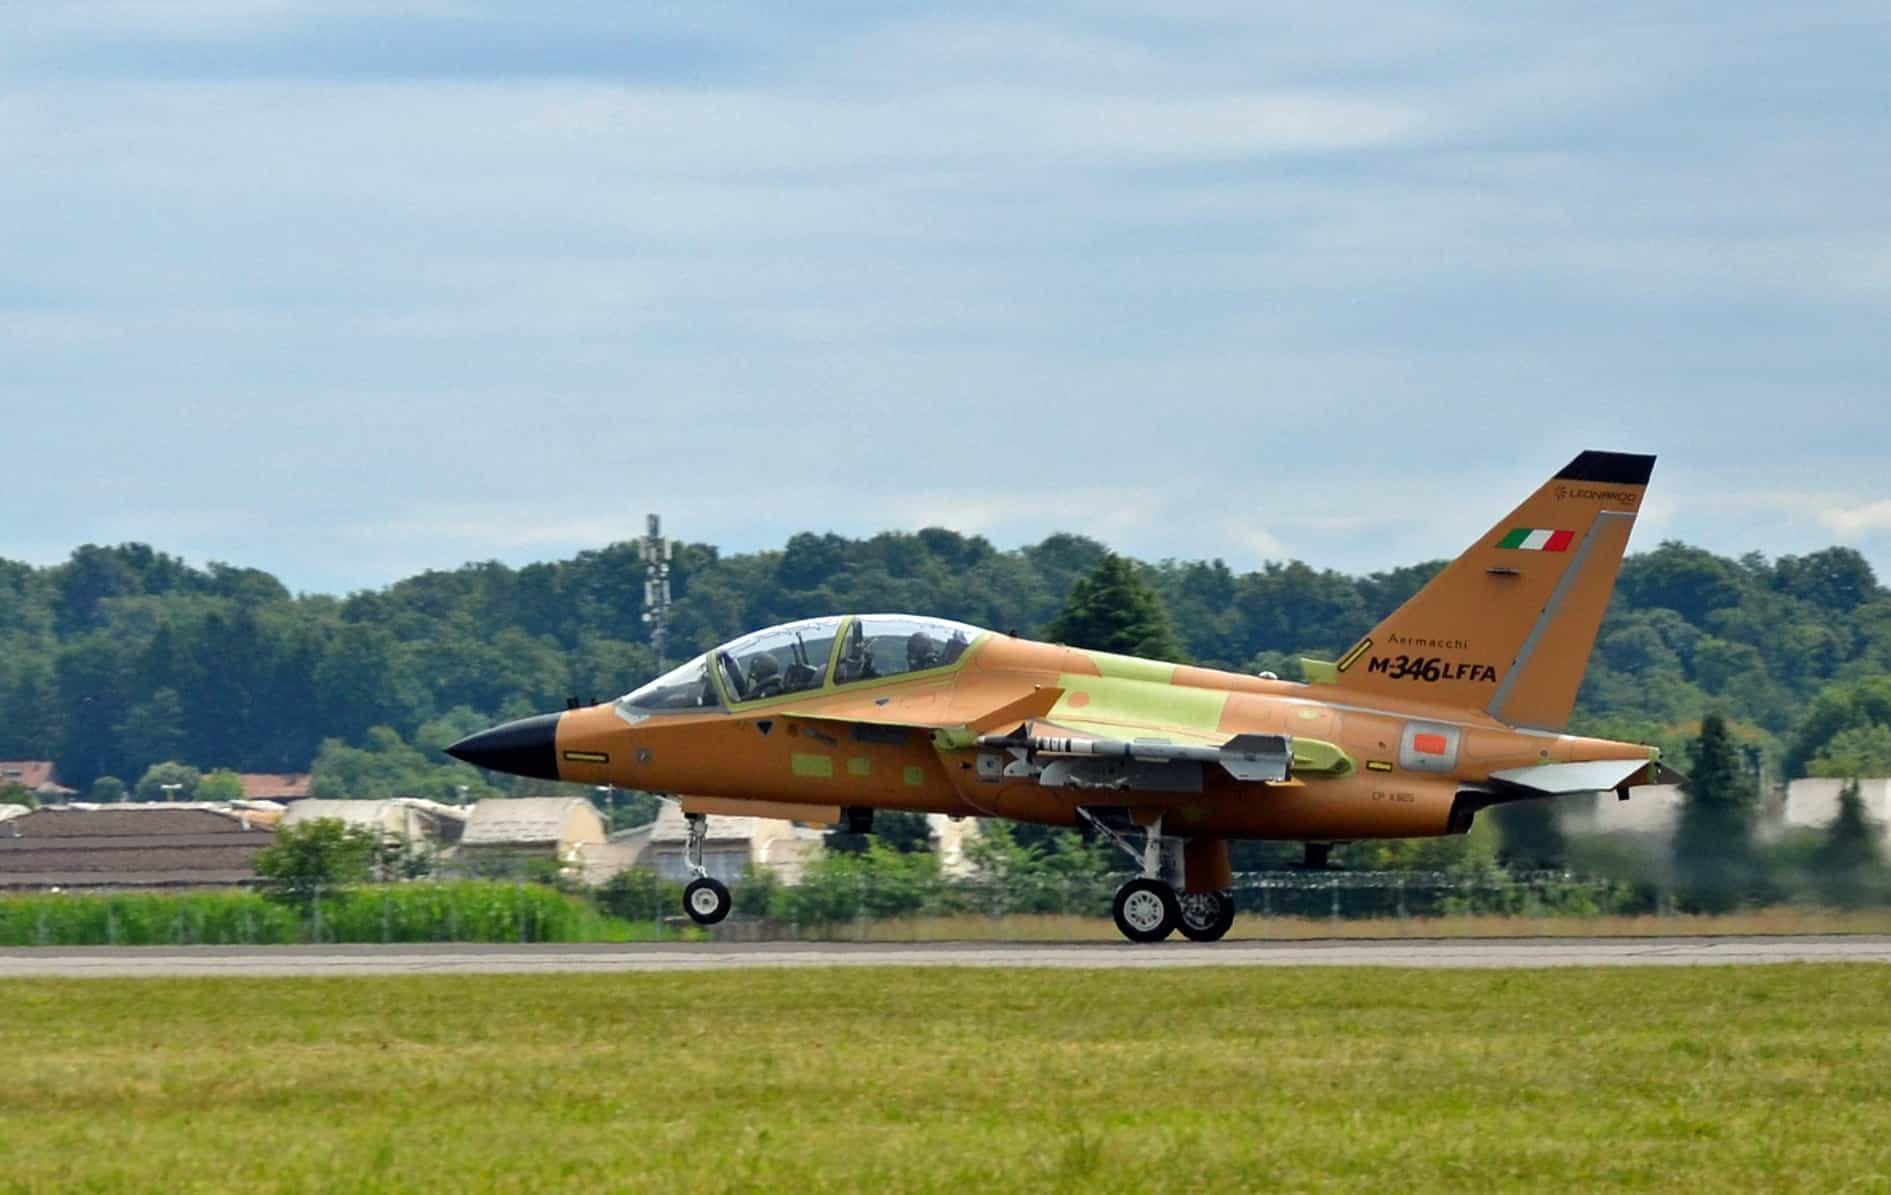 Літак M-346 «Fighter Attack». Липень 2020. Фото: Leonardo